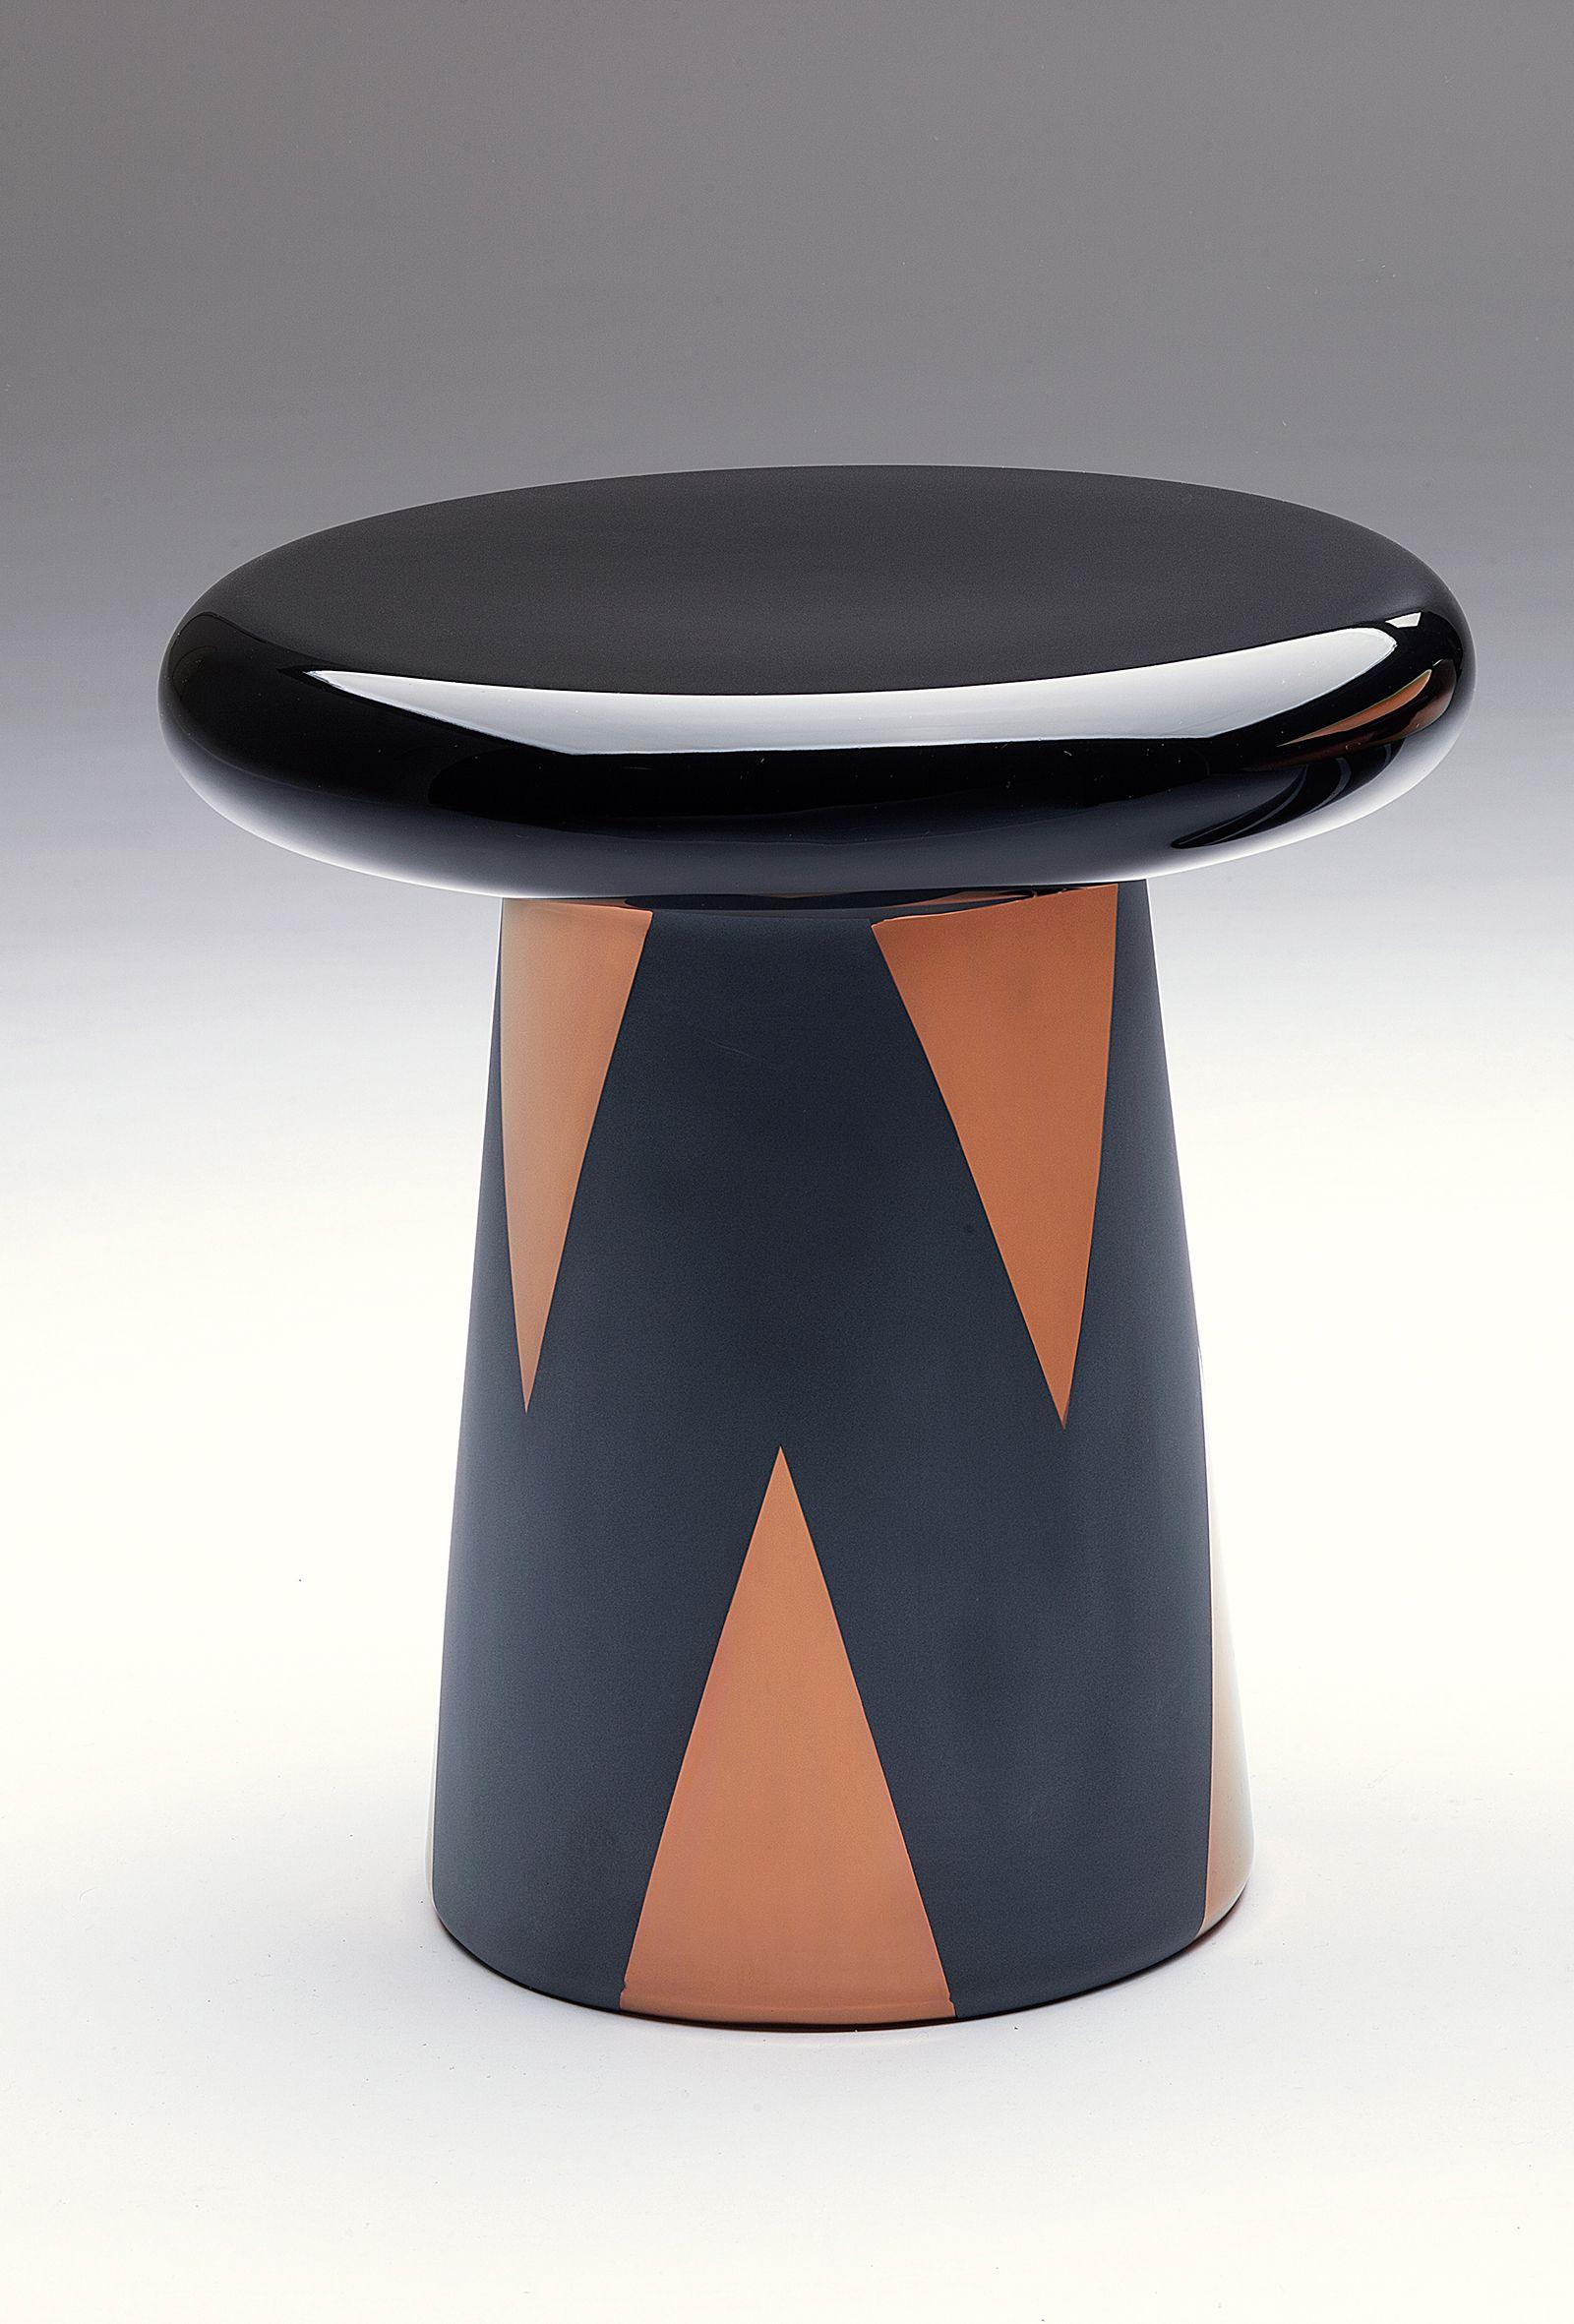 510d0189838f8a2a50eb08c2da4cf927 Unique De Table Basse Noyer Design Concept